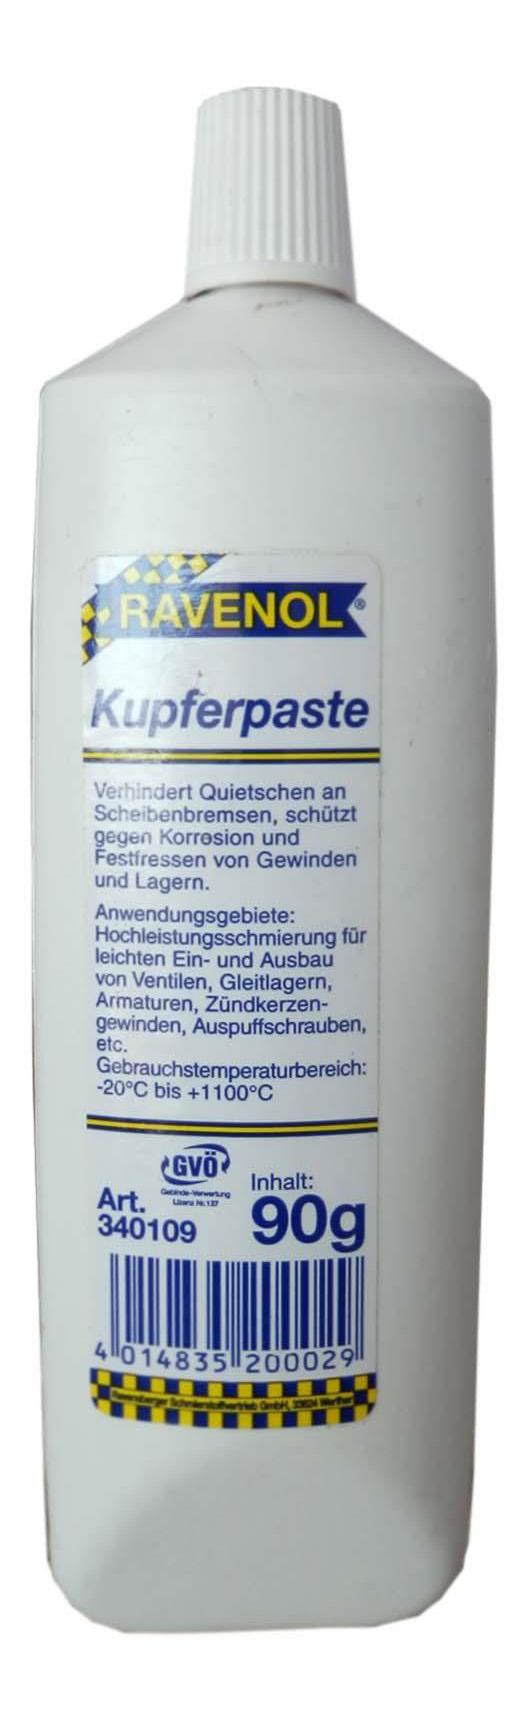 Смазка медная Ravenol Kupferpaste 1340109 090